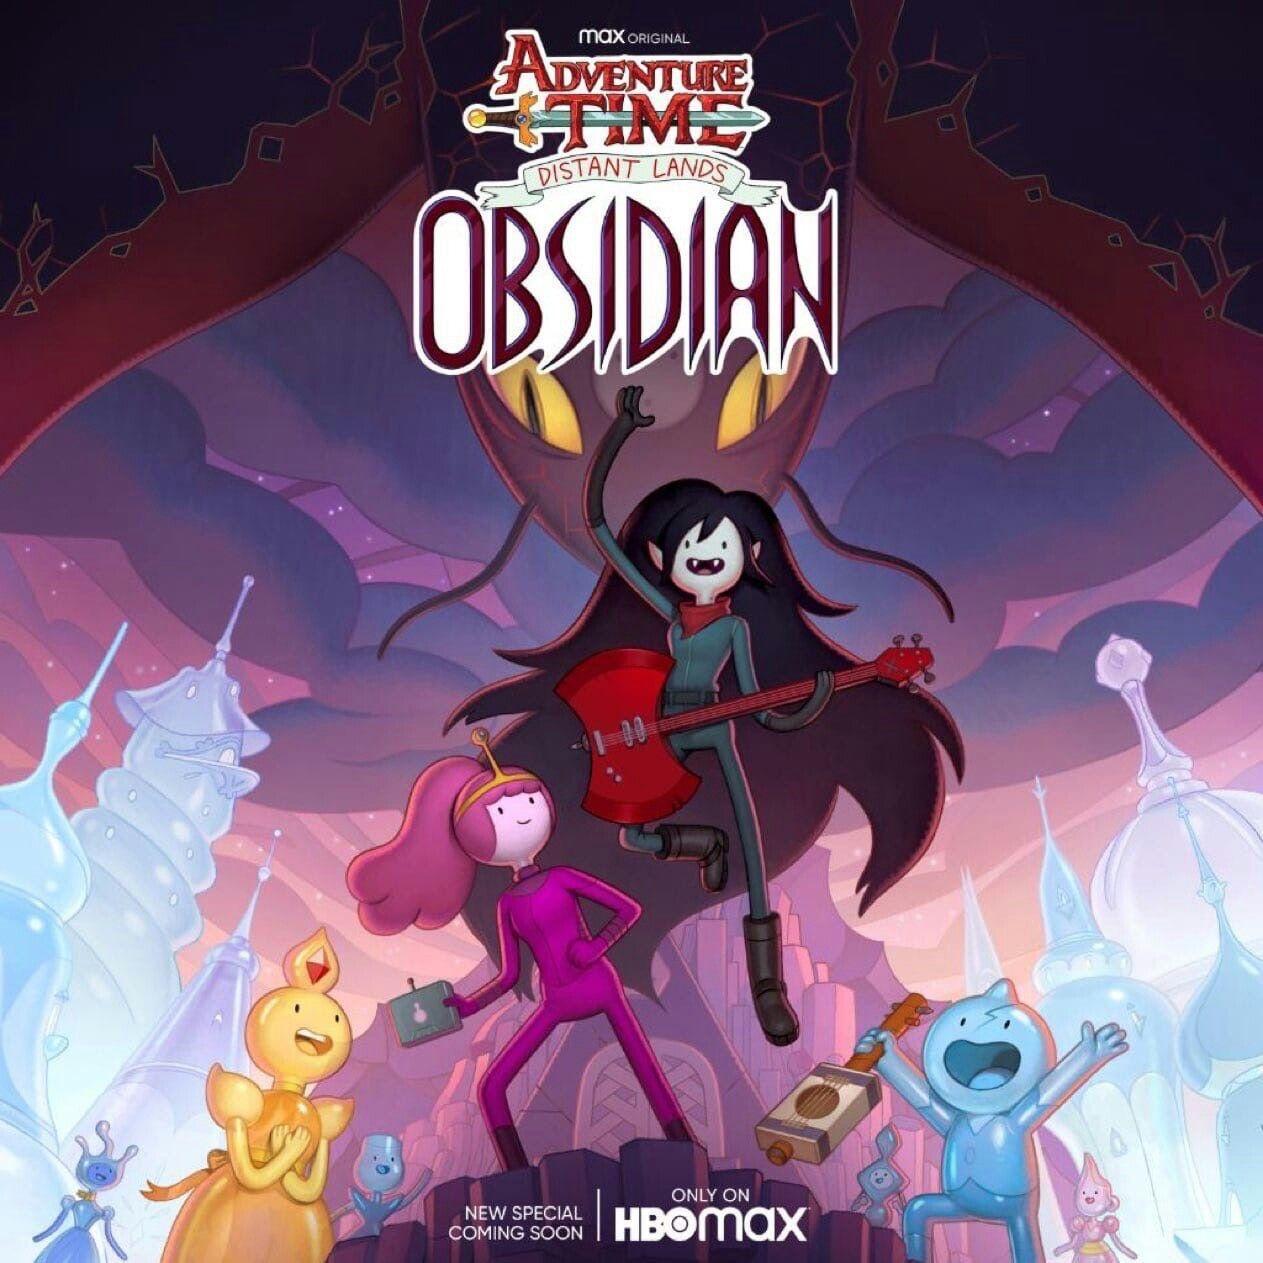 adventure time distant lands obsidian